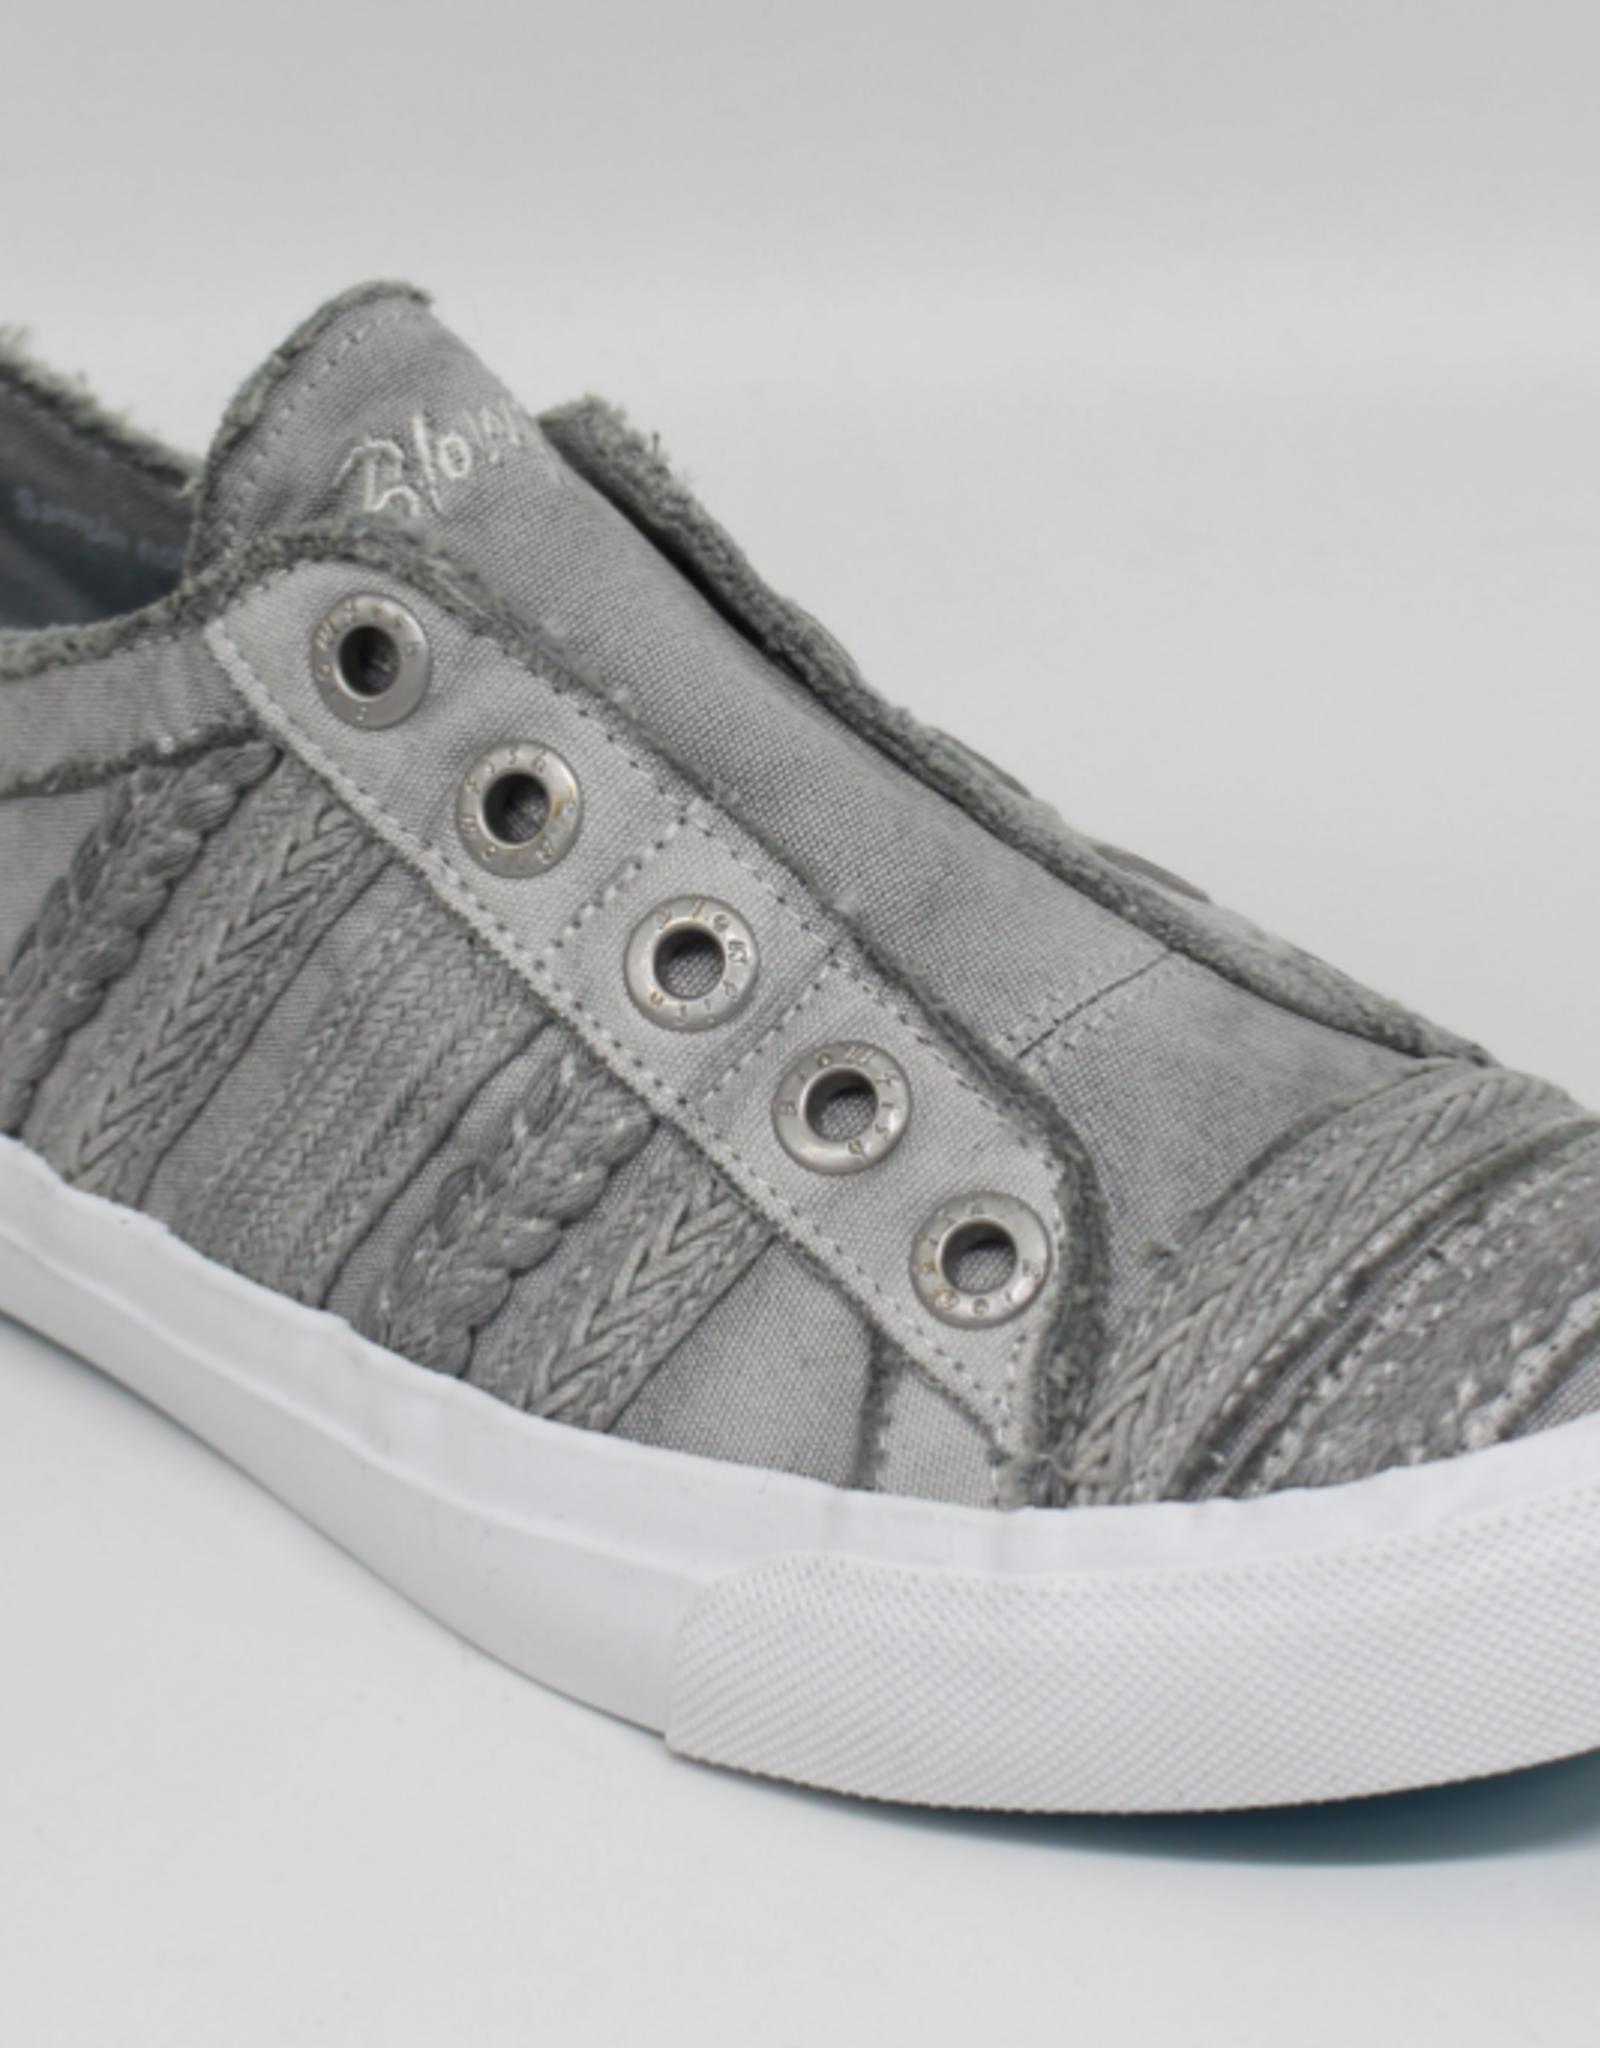 TLC zs-0917 parlane shoe